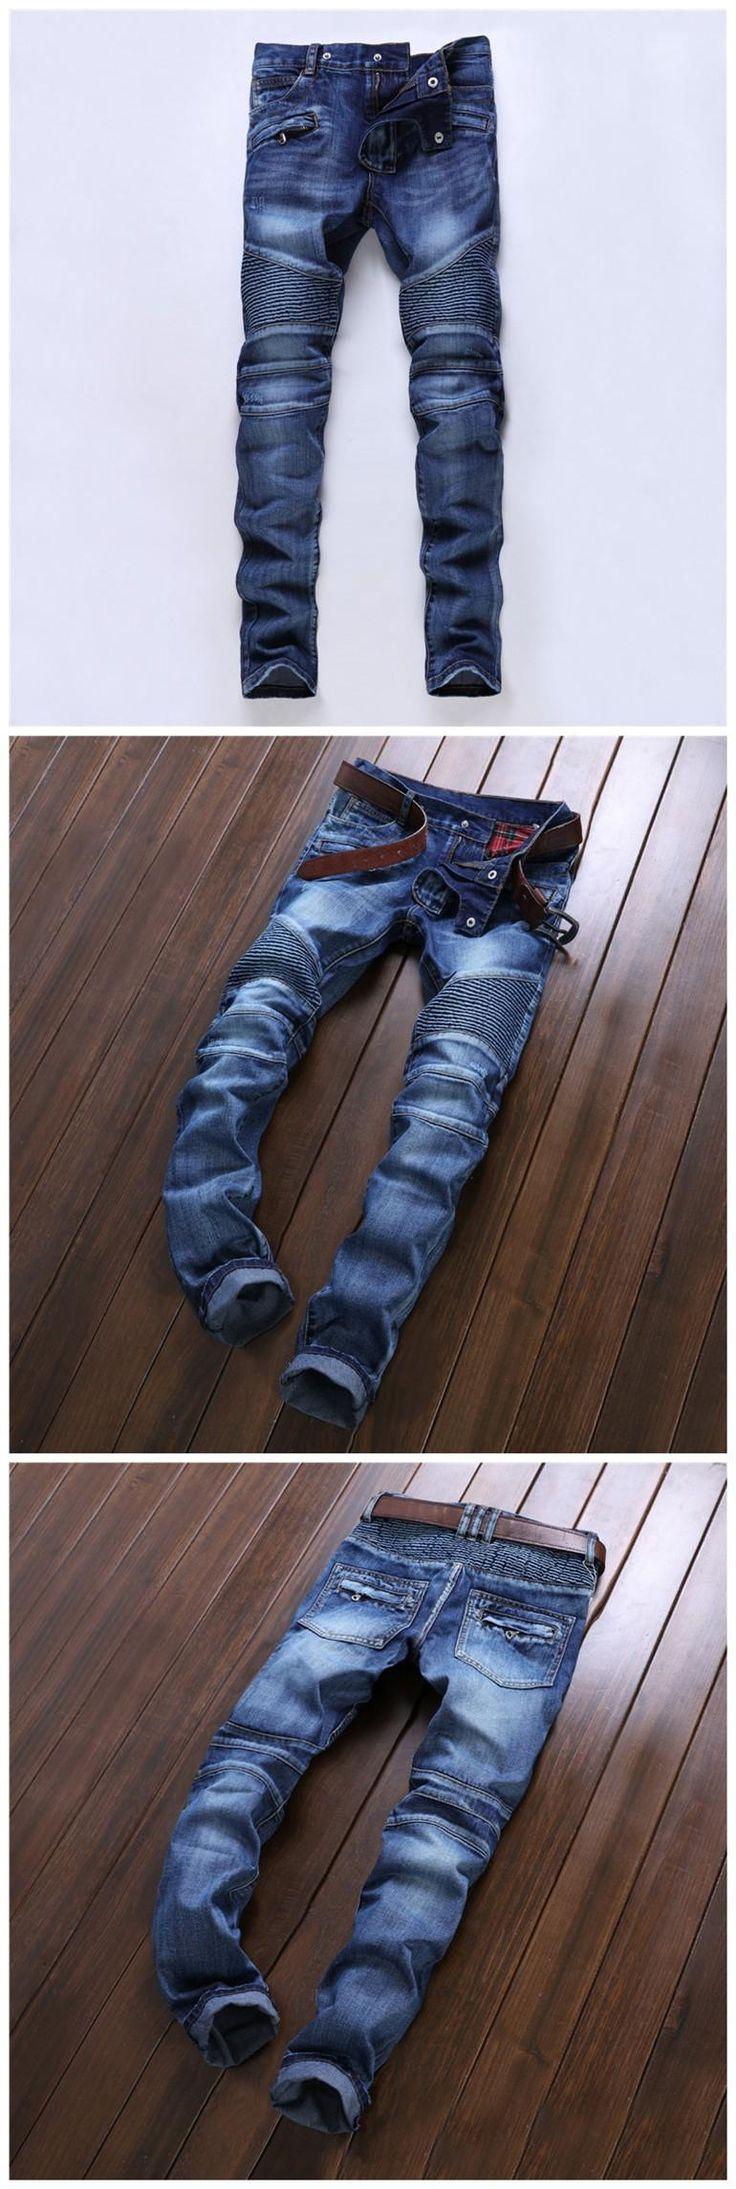 2016 Balmain Jeans Men 2016 Hot Mens Designer Jeans Famous Brand Balmain Jeans Men Distressed Jeans Ripped Denim Jn01 From Top_trading, $53.27 | Dhgate.Com